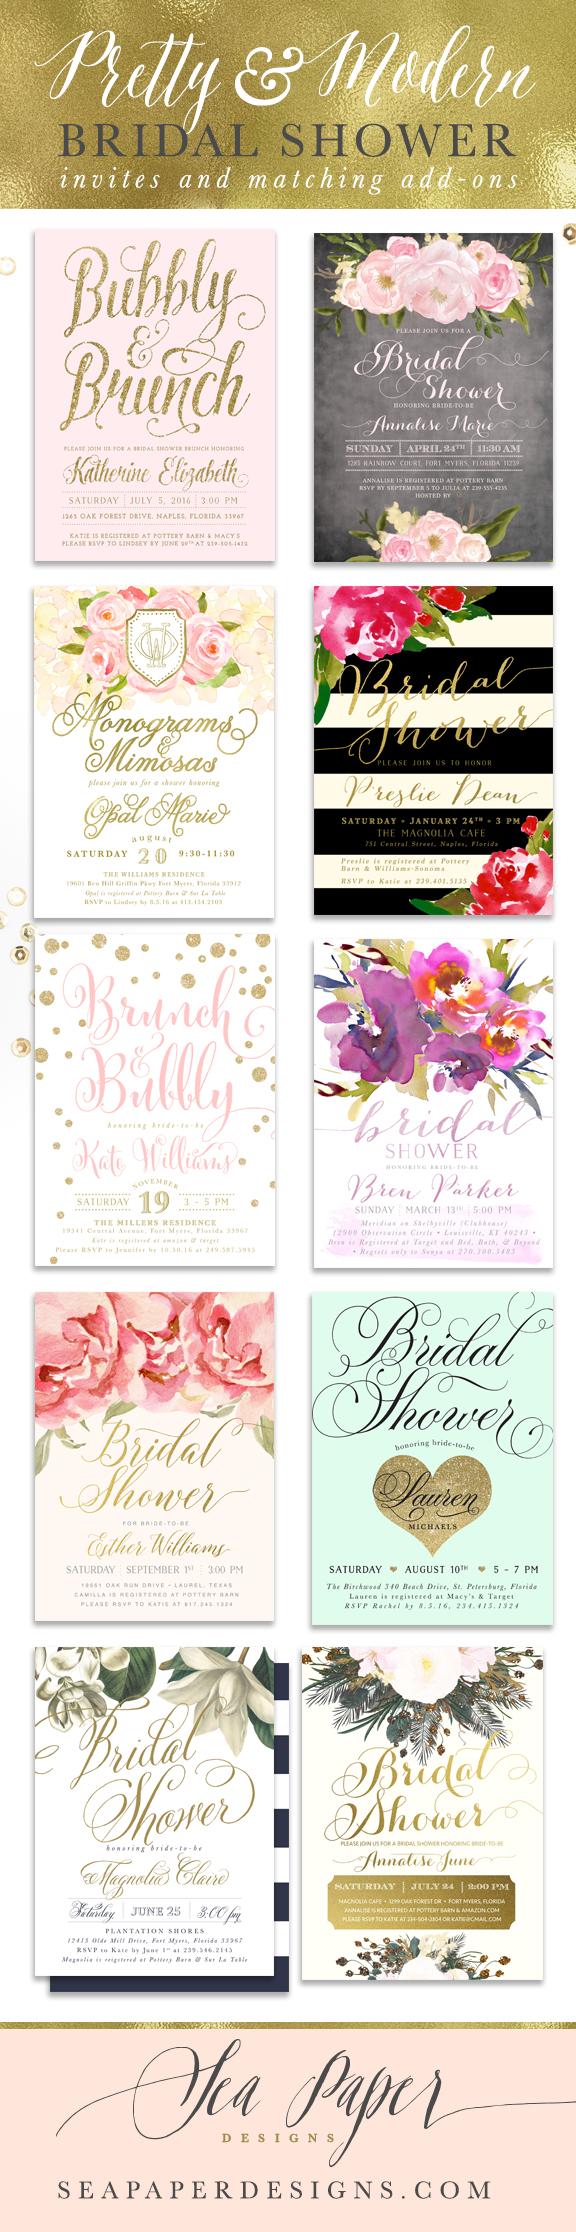 Pretty, Classy & Modern Bridal Shower Invitations, matching add-on ...